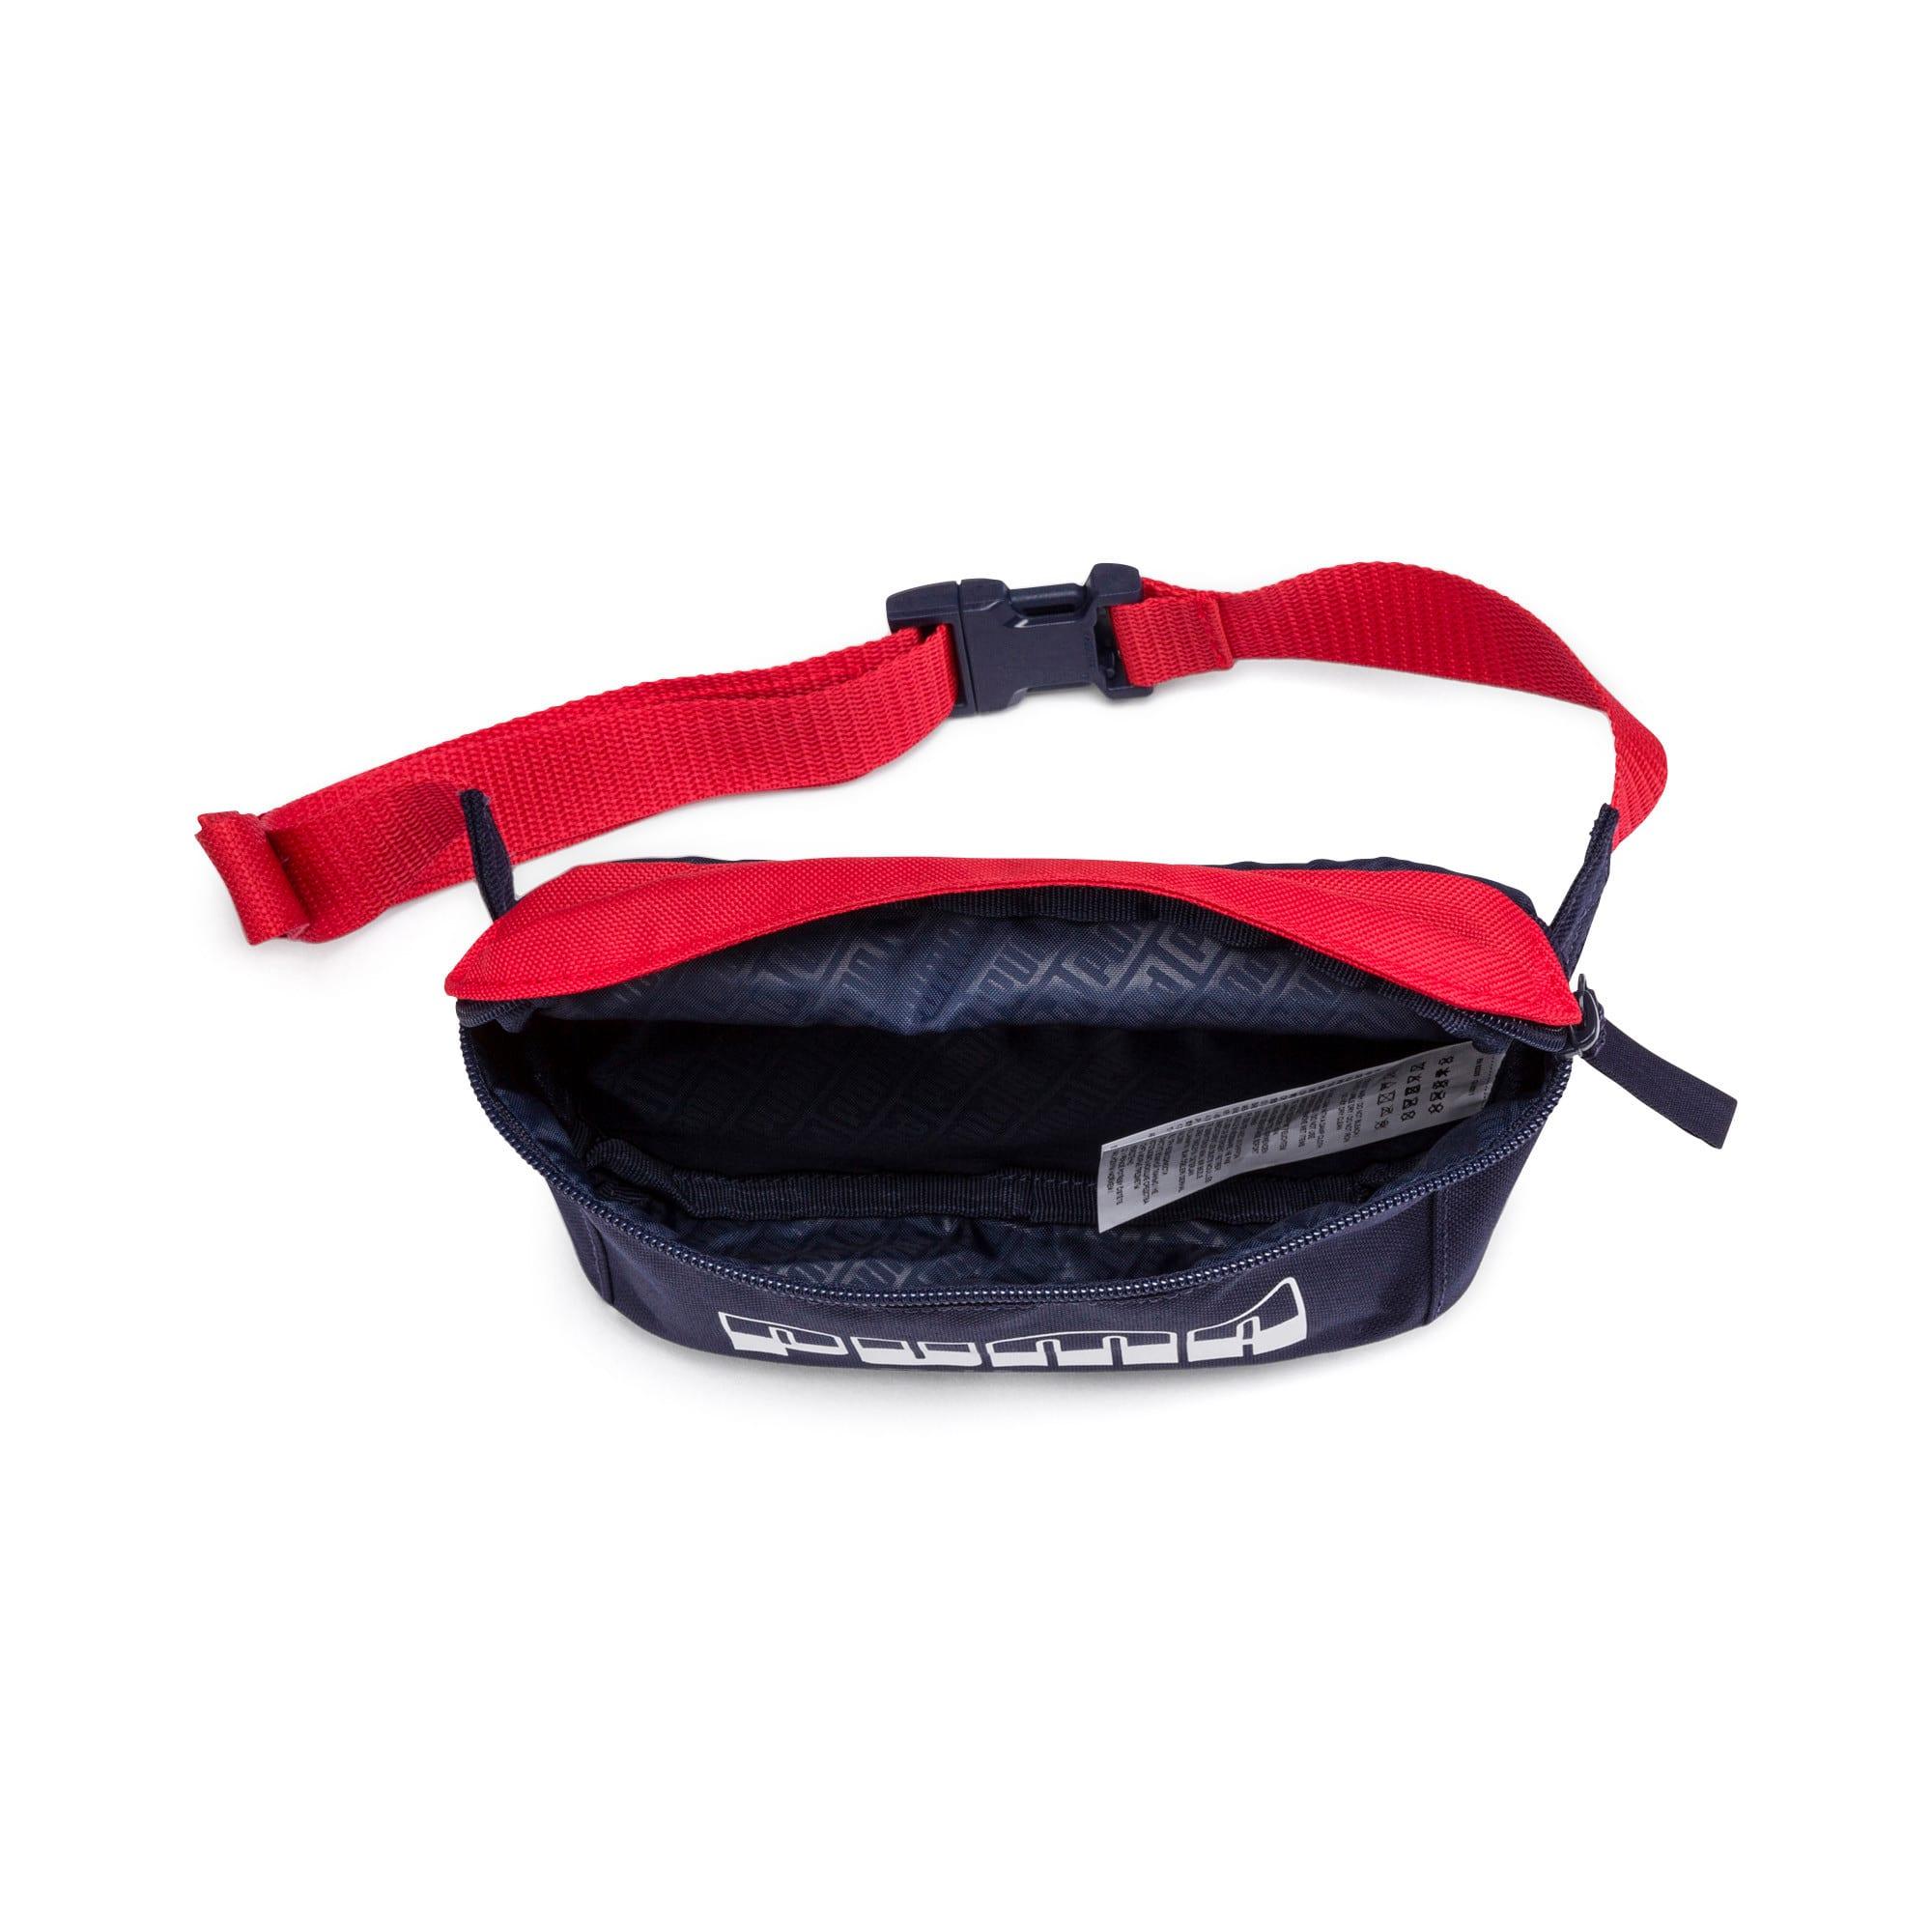 Thumbnail 3 of Plus Waist Bag II, Peacoat-High Risk Red, medium-IND